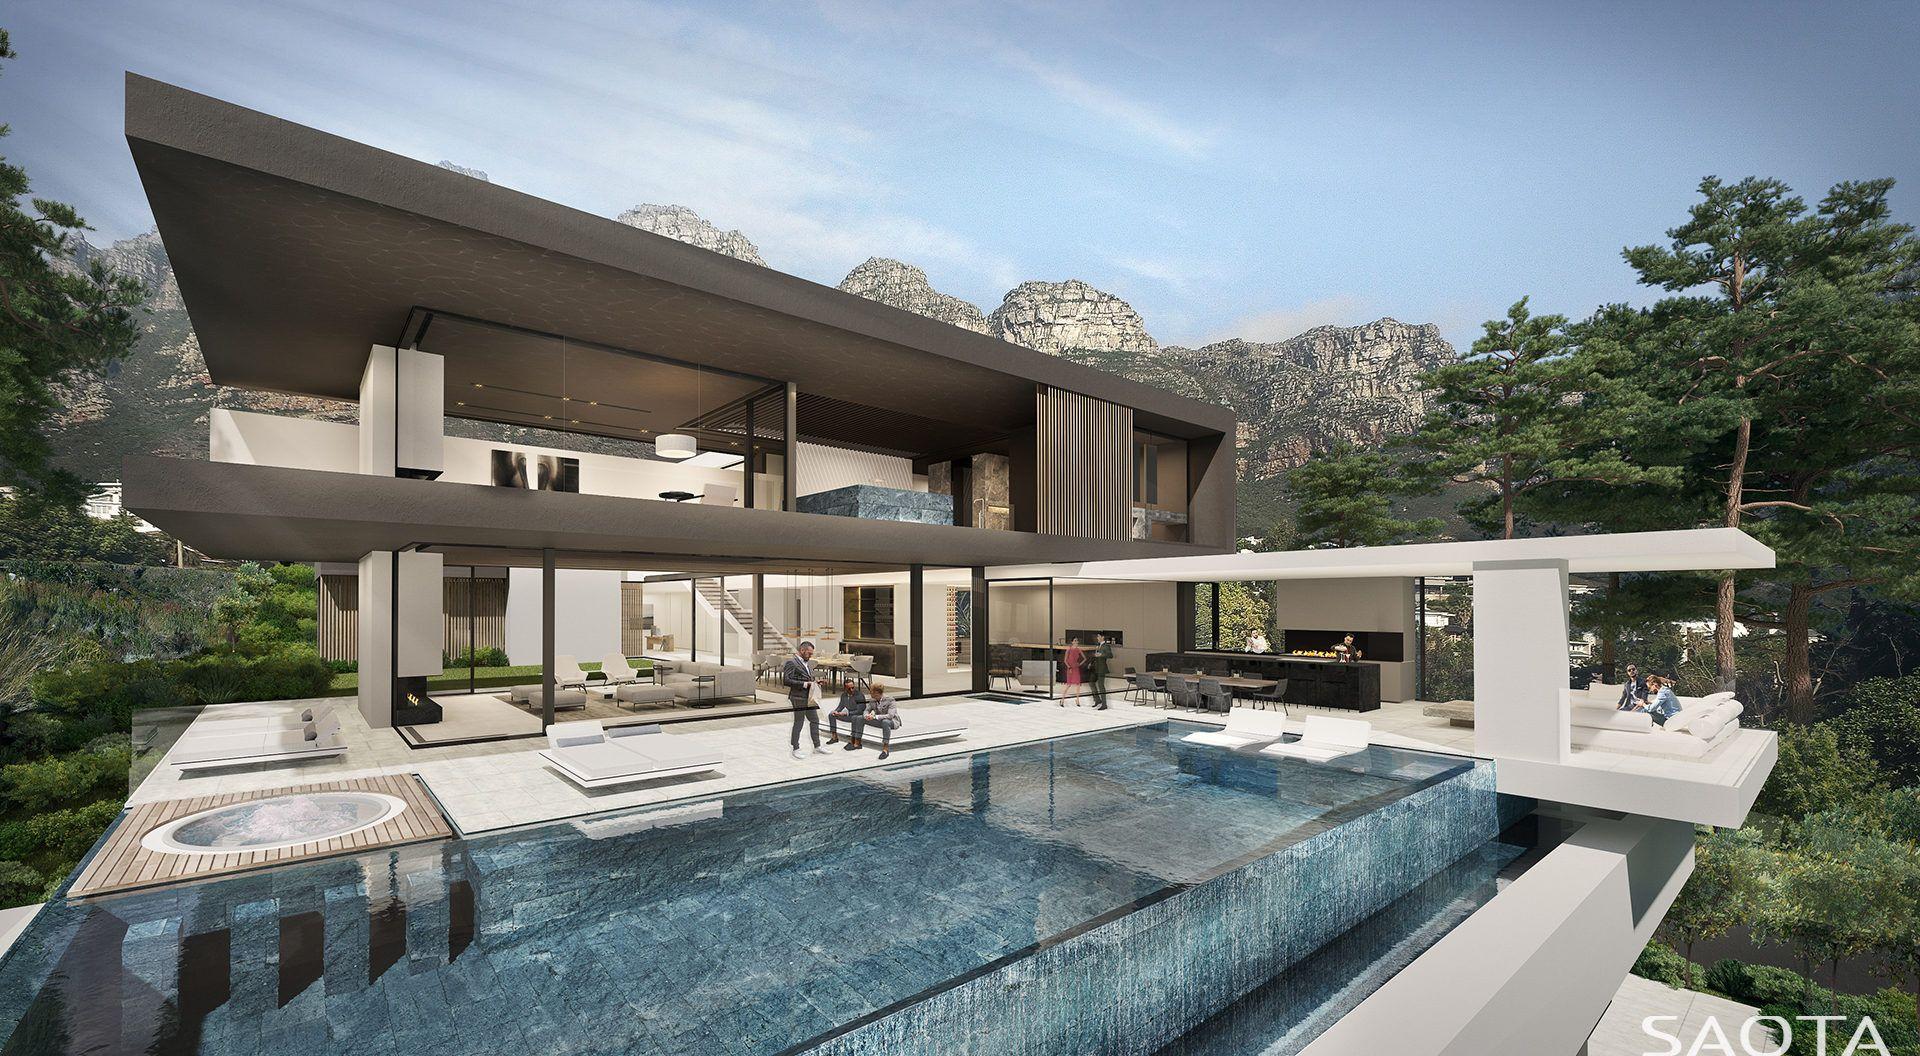 ZA CHASBOOTH SAOTA Architecture and Design